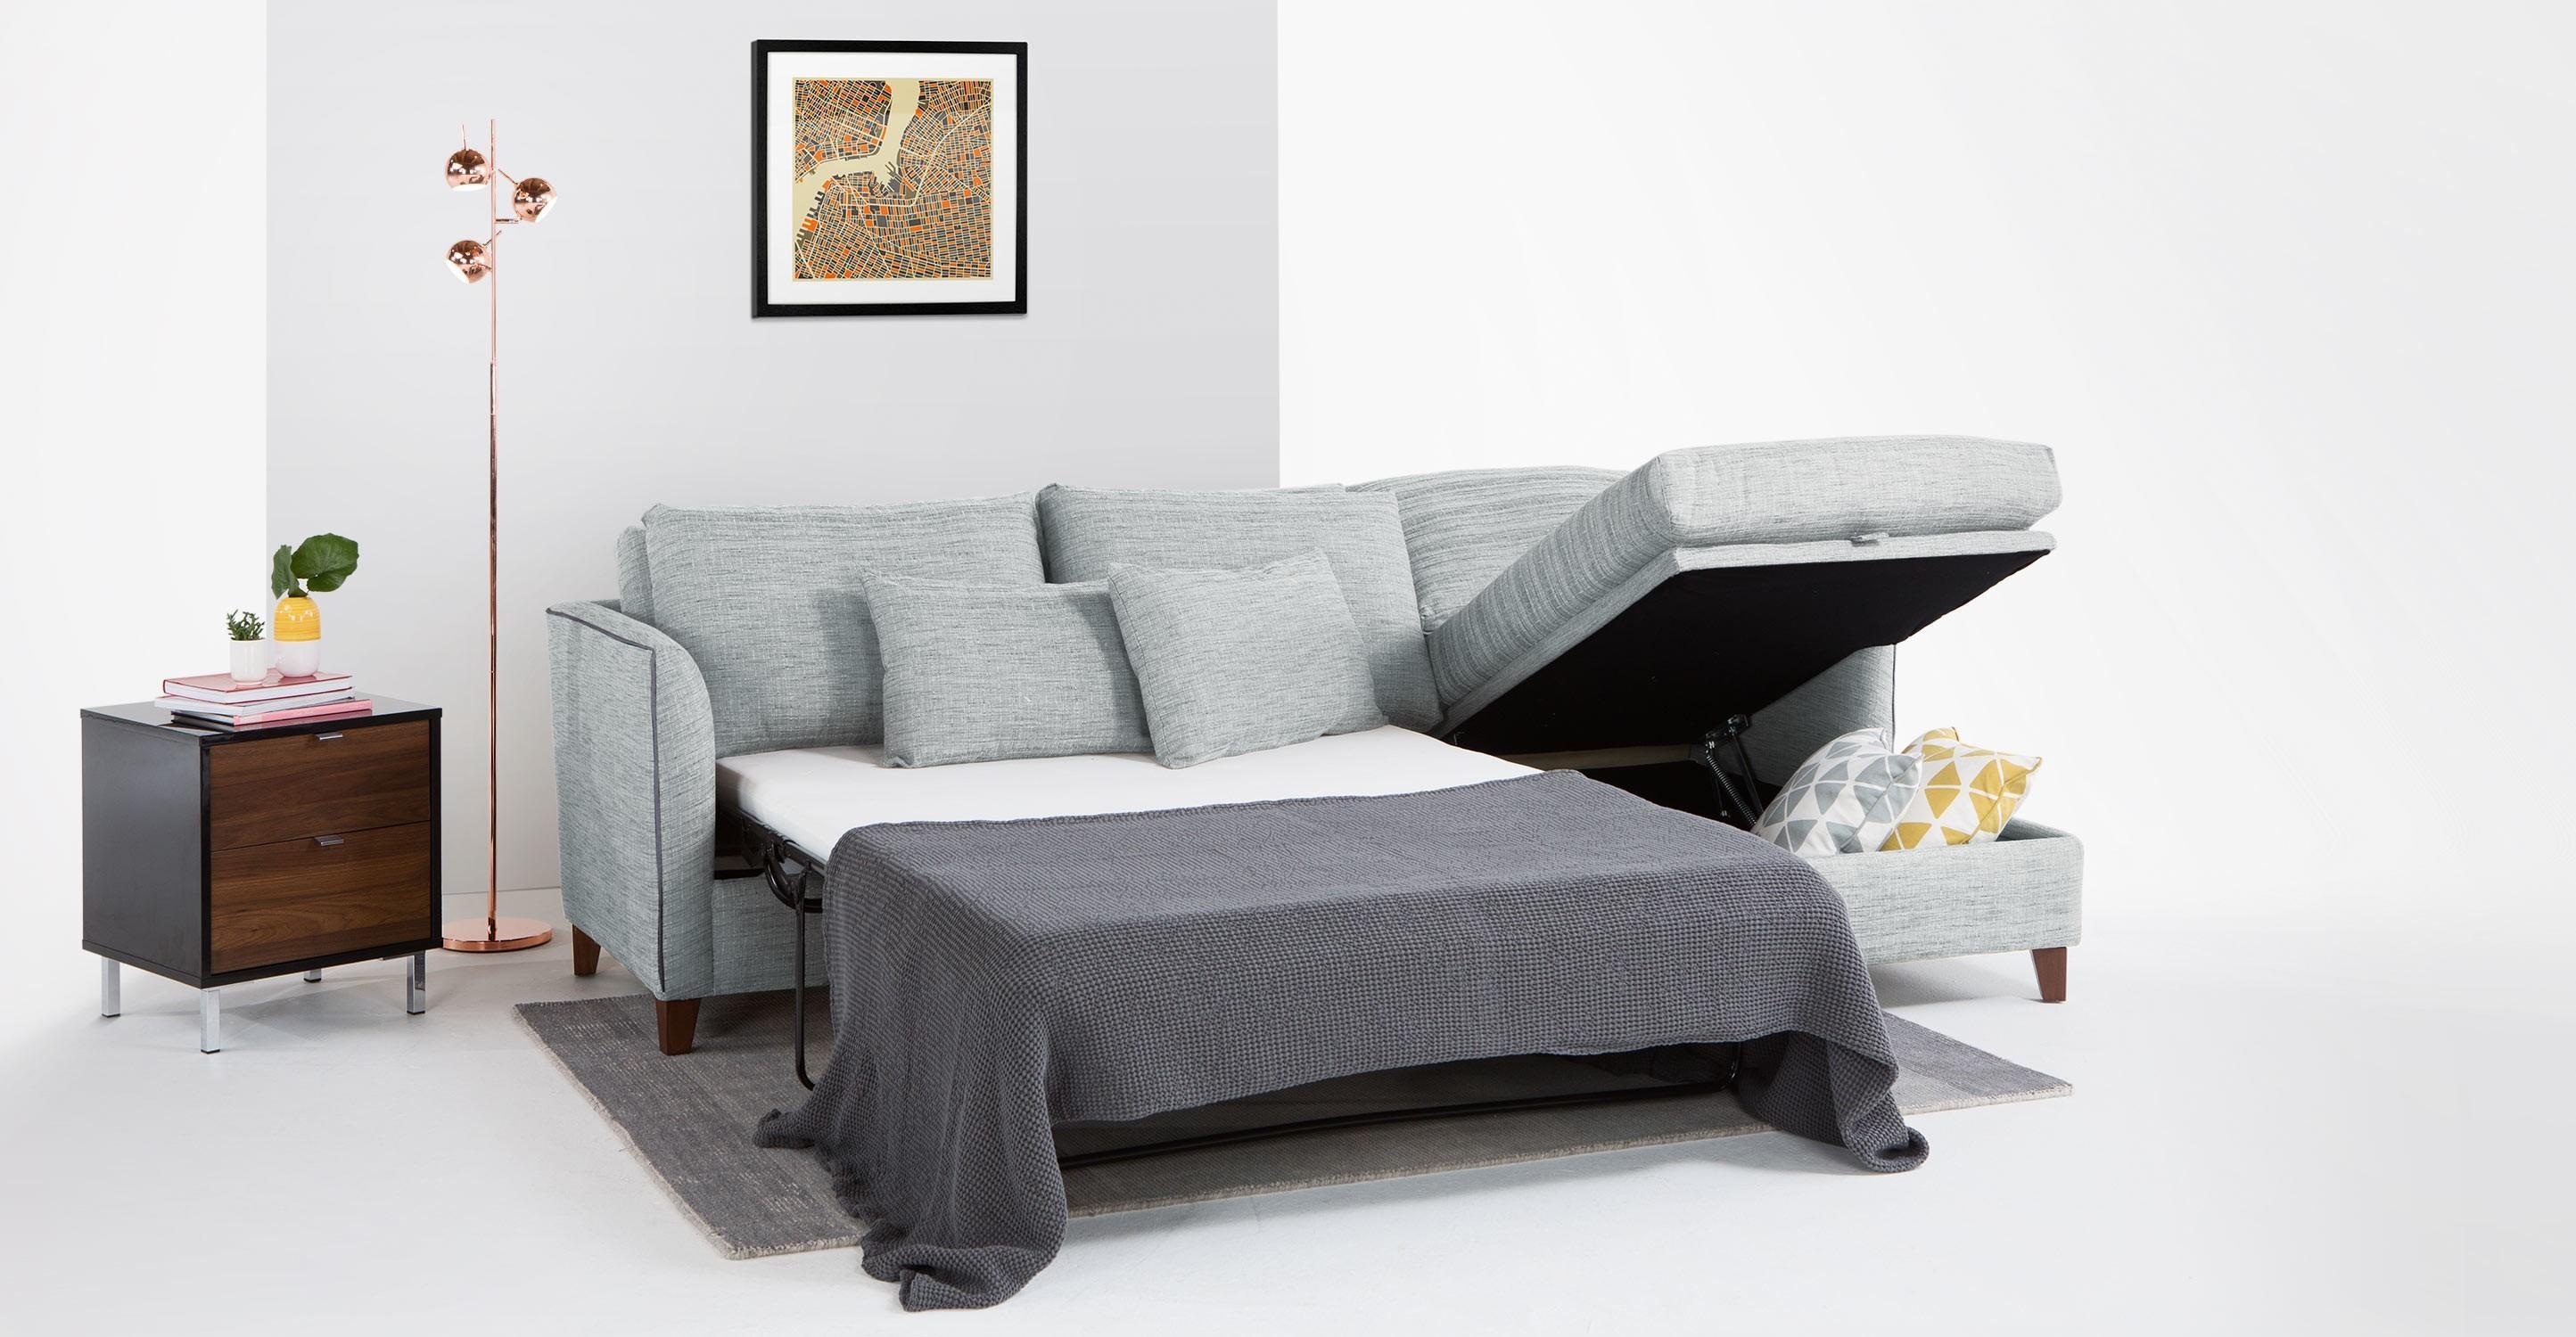 Furniture: Kmart Futon Bunk Bed | Futon Beds Walmart | Kebo Futon Throughout Kmart Futon Beds (Image 7 of 20)